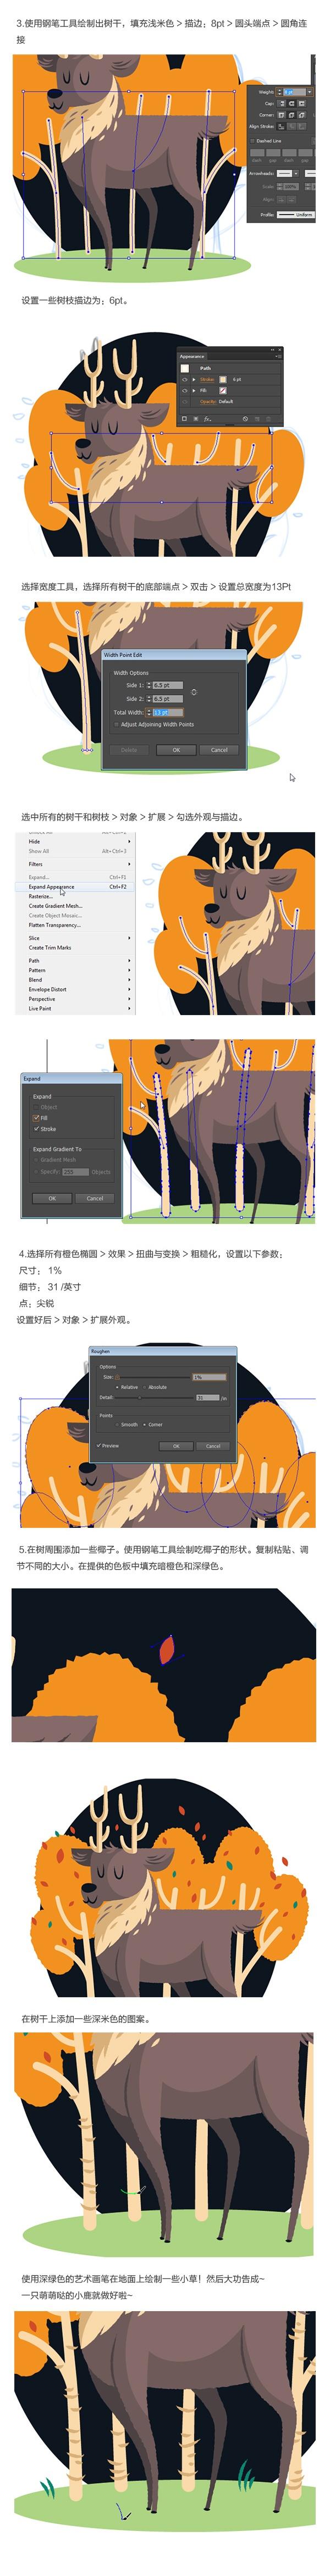 AI基础教程!教你绘制萌萌的小驯鹿插画